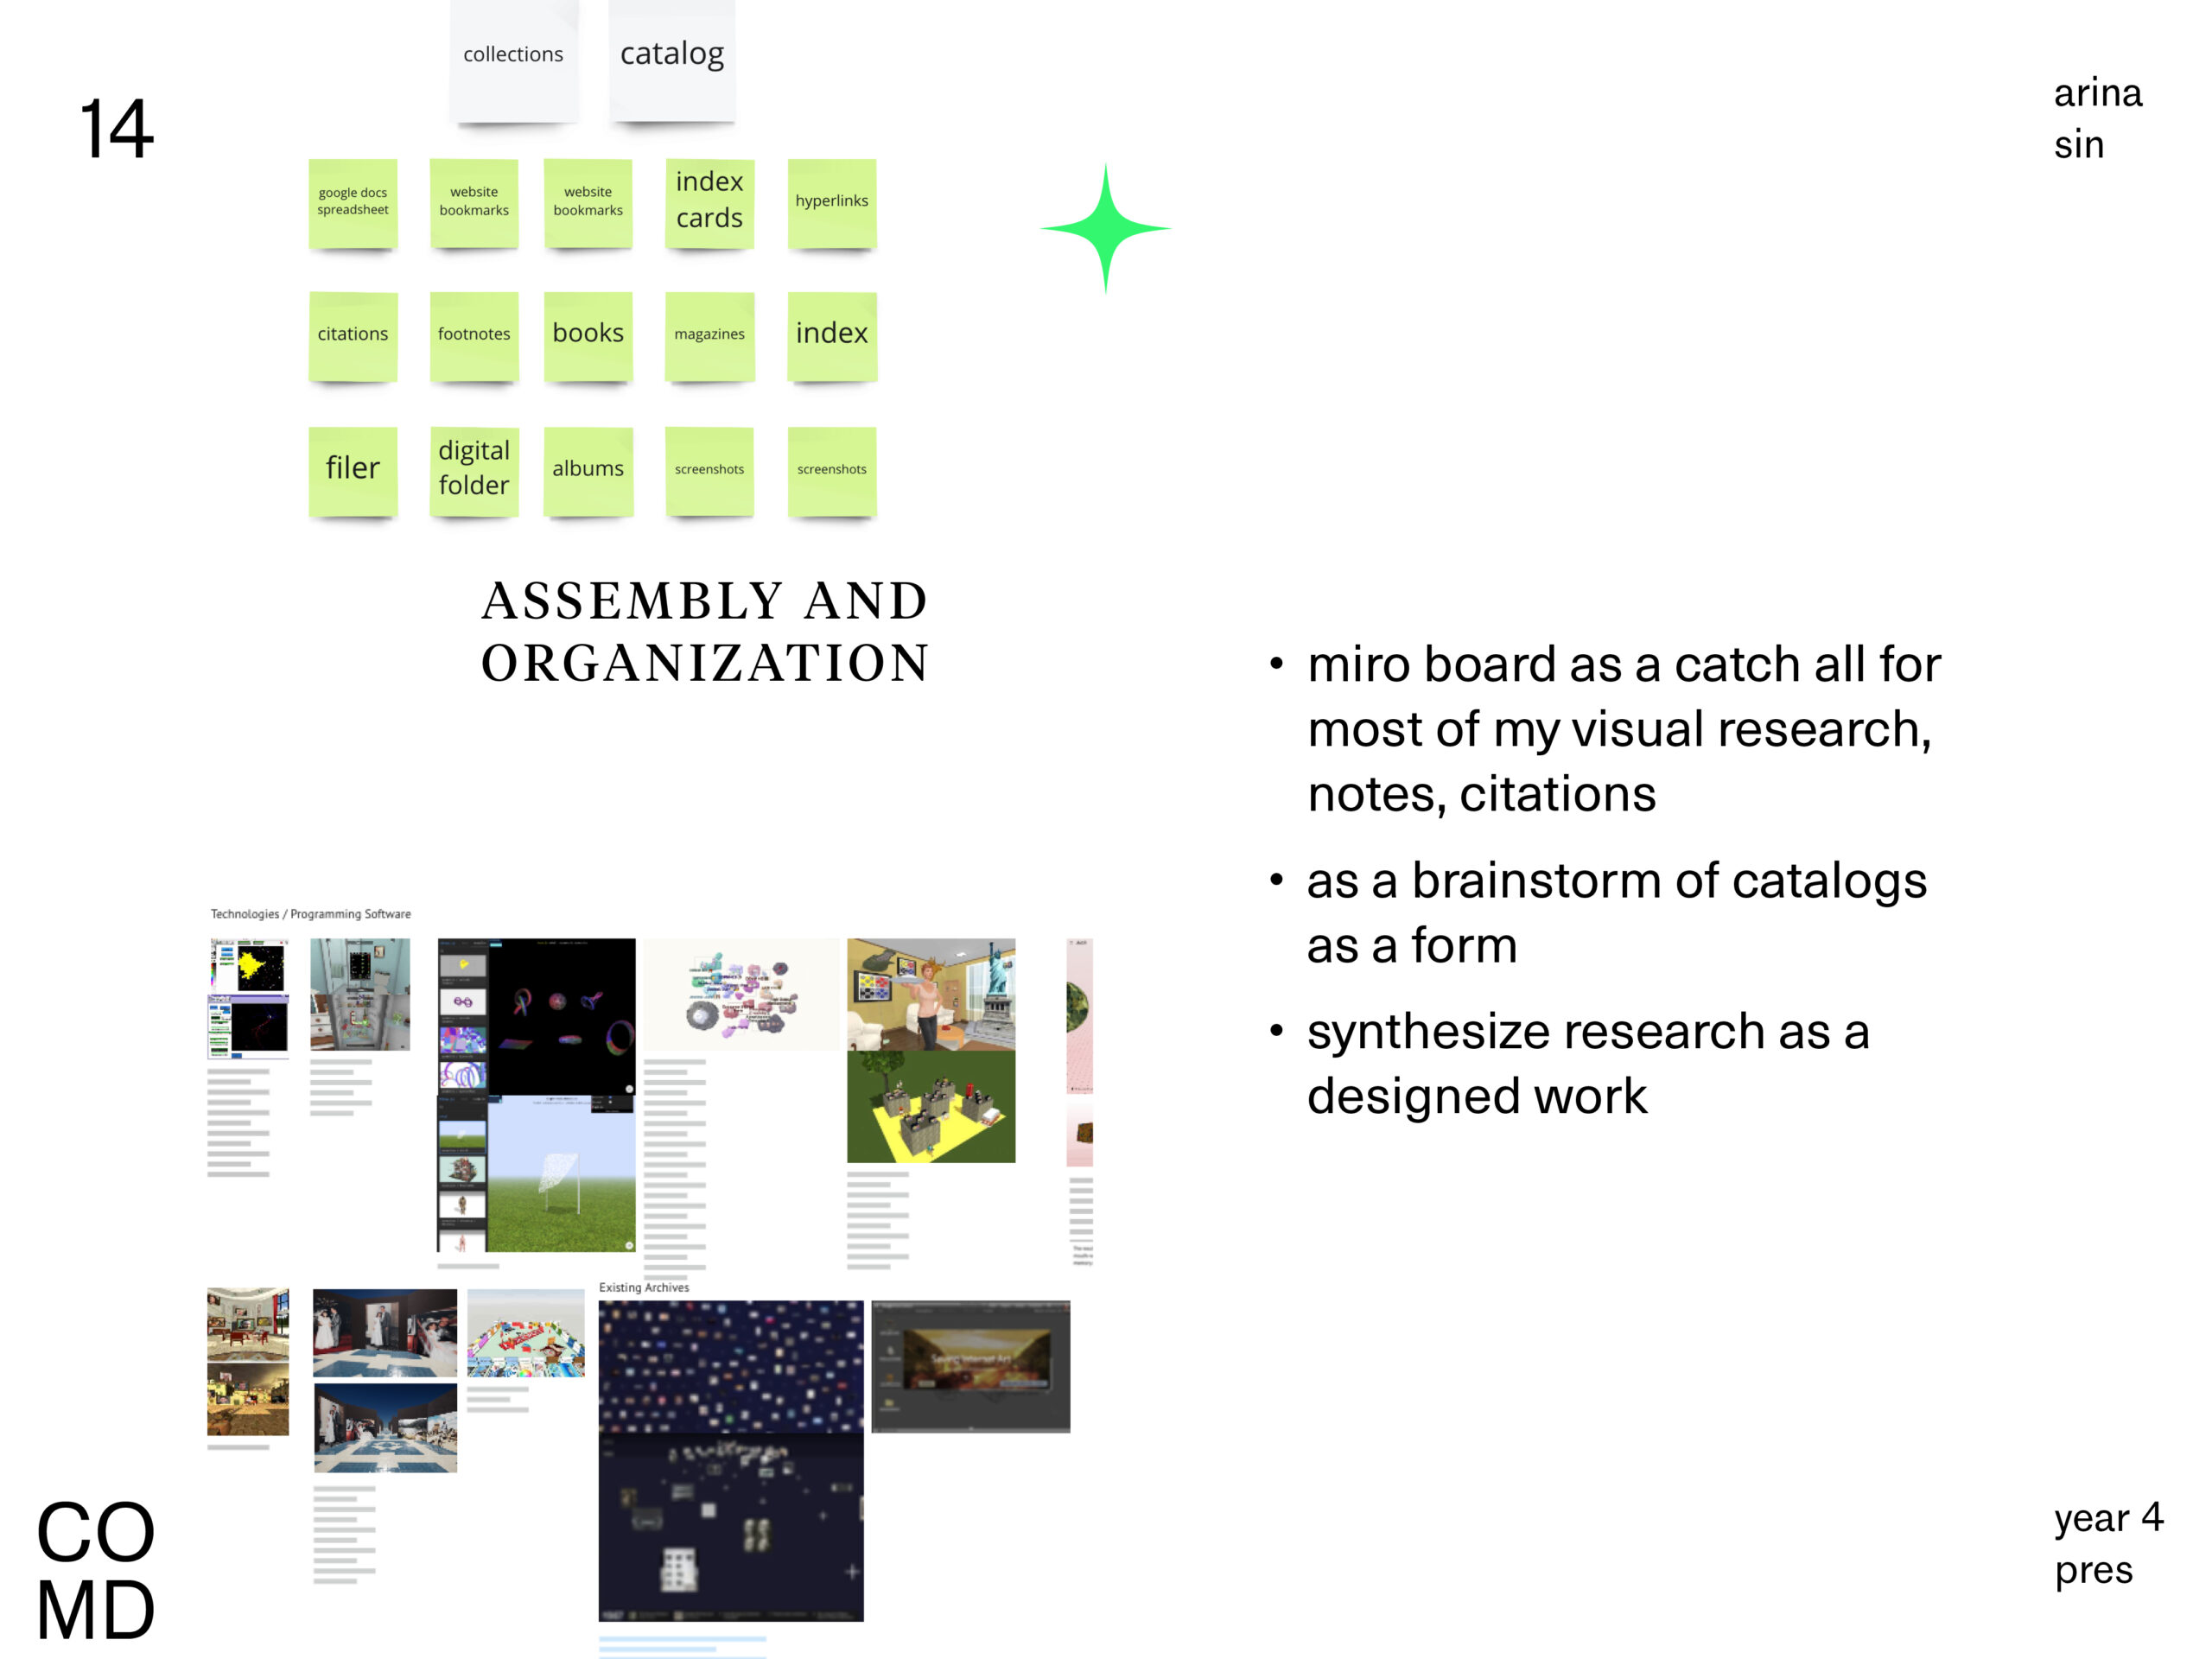 presentation_ArinaSin14